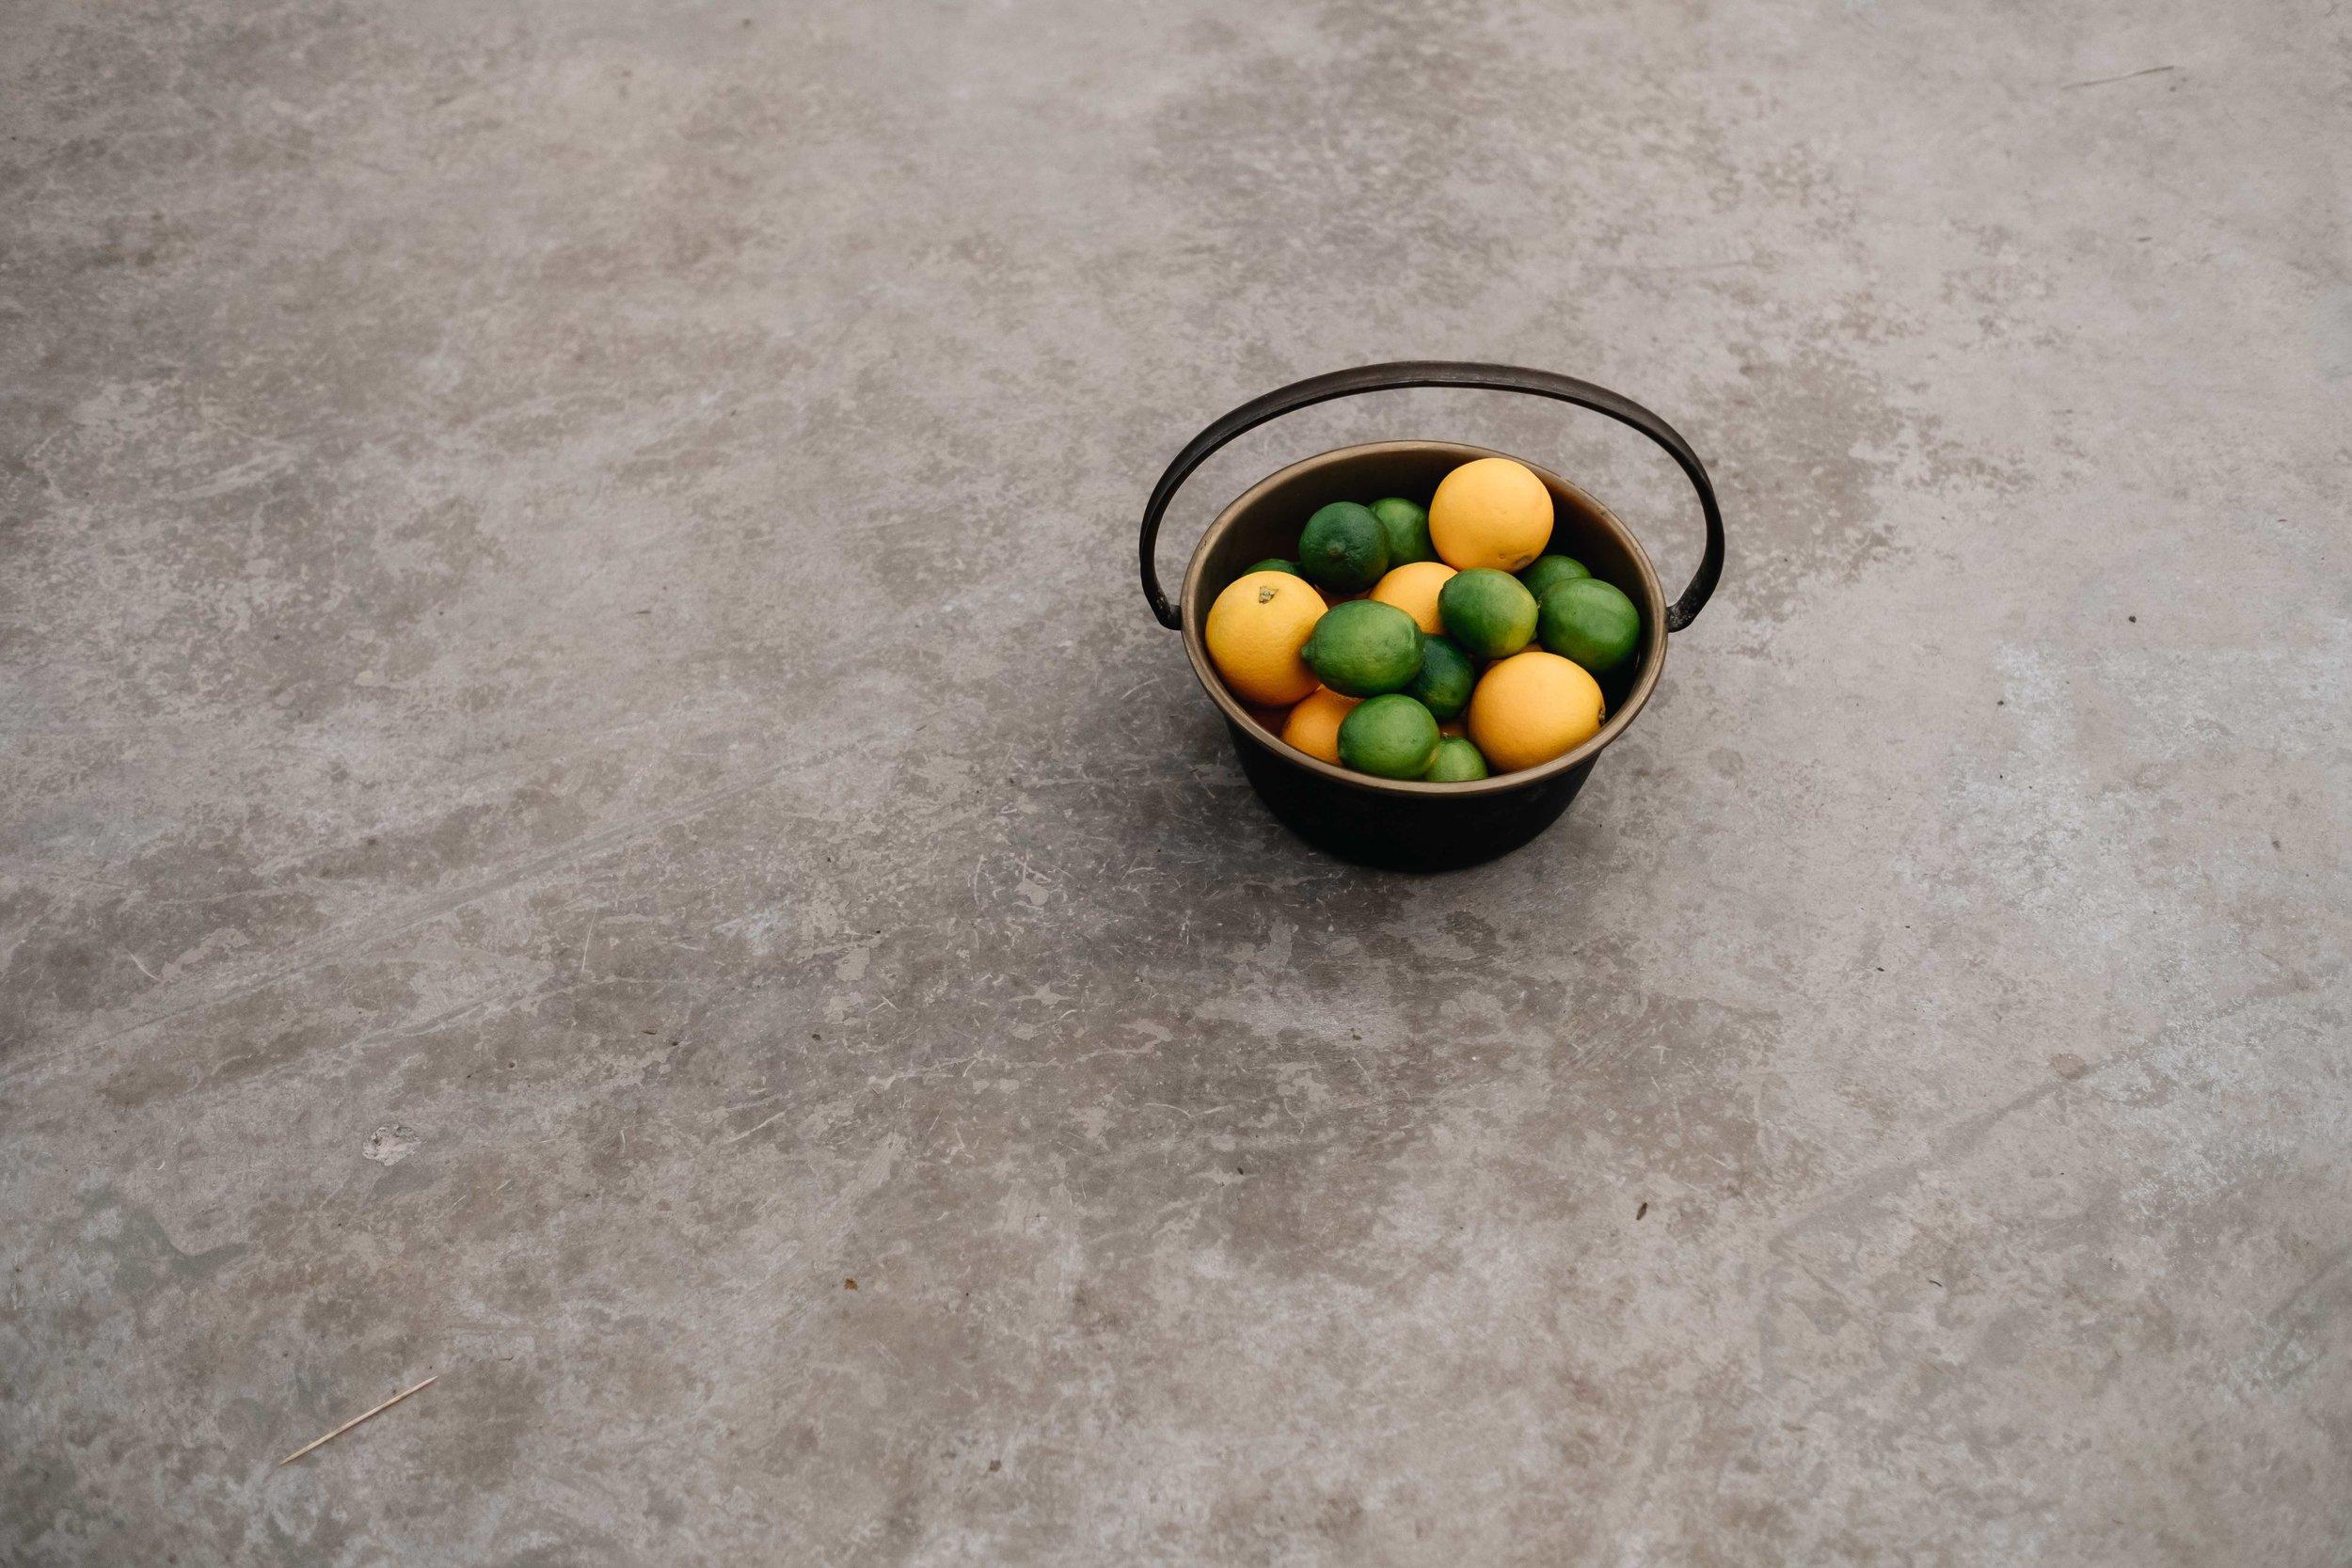 lemons and limes on the floor